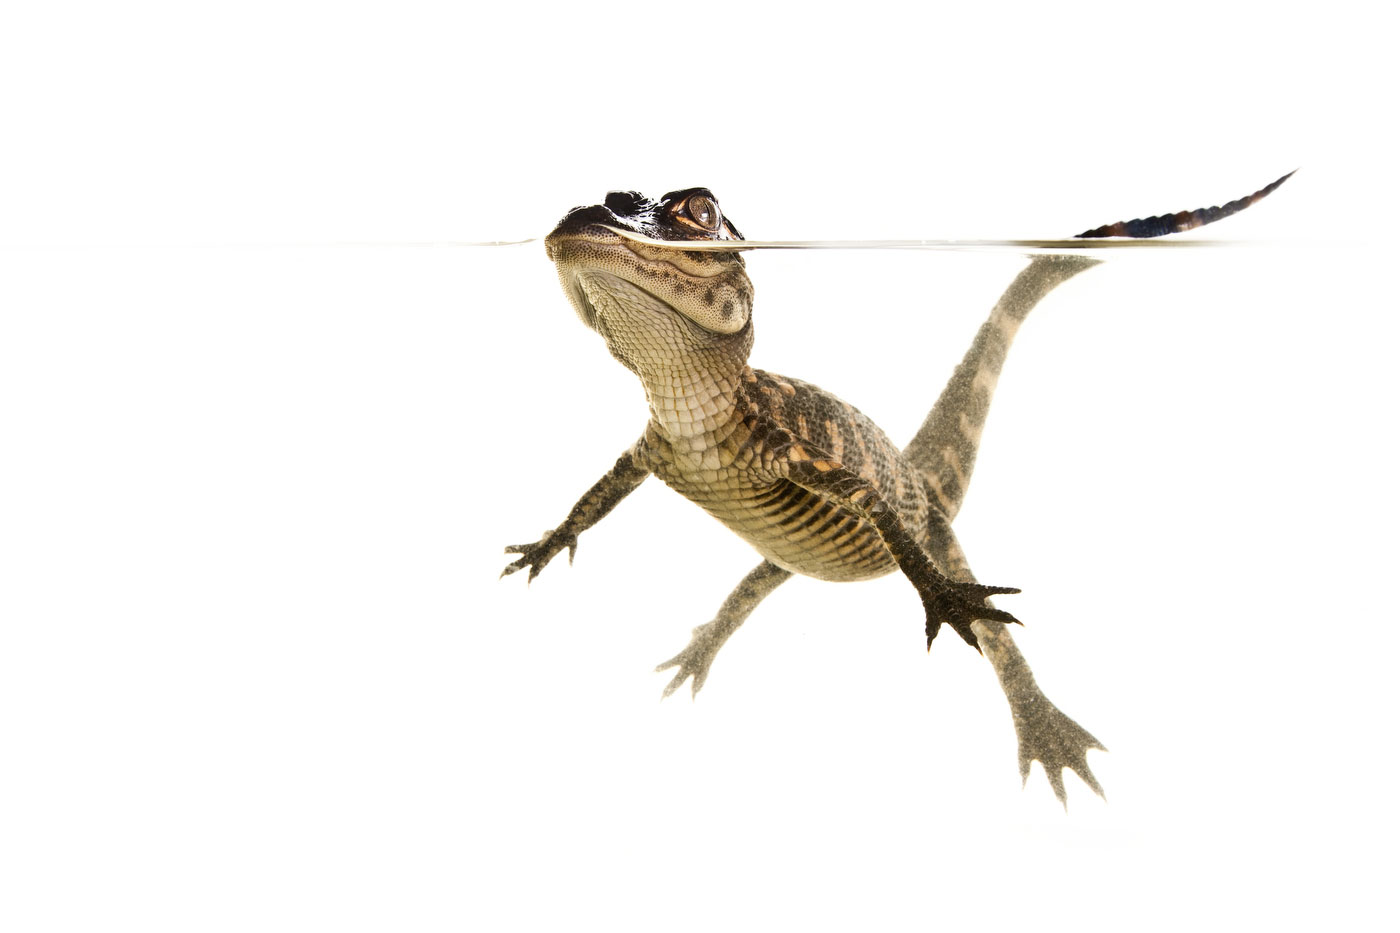 American Alligator, Alligator mississippiensis, everglades, florida, photo